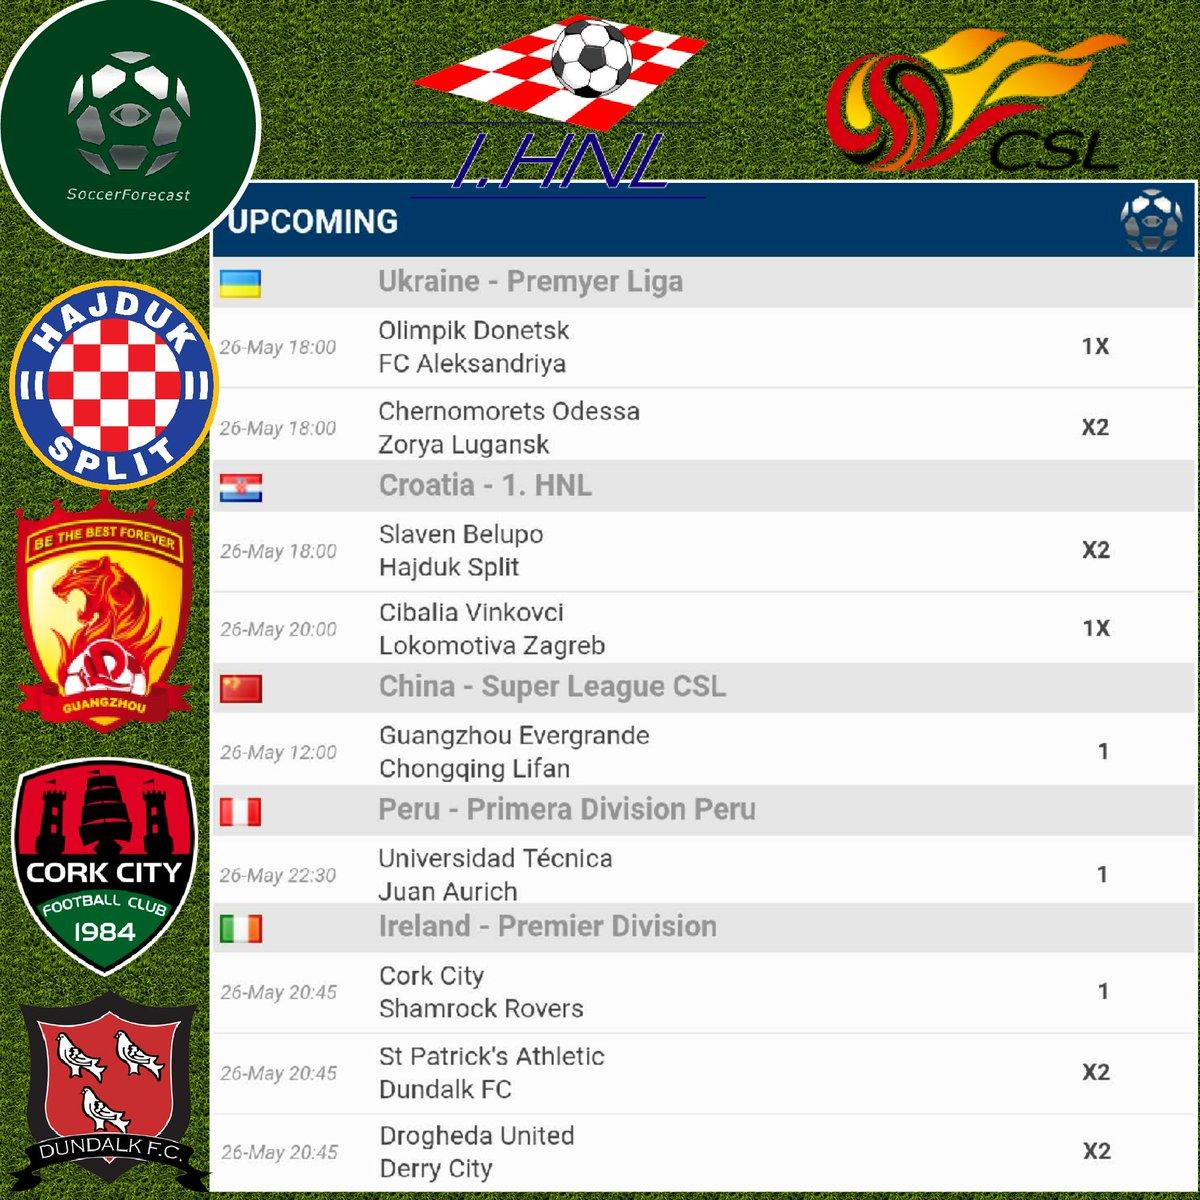 Todays correct forecasts #soccer #football #足球 #Apple #Android #iOS #calcio #ukraina #Donetsk #hajduk #split #GuangzhouEvergrande #Peru<br>http://pic.twitter.com/6BNEJdY8AR